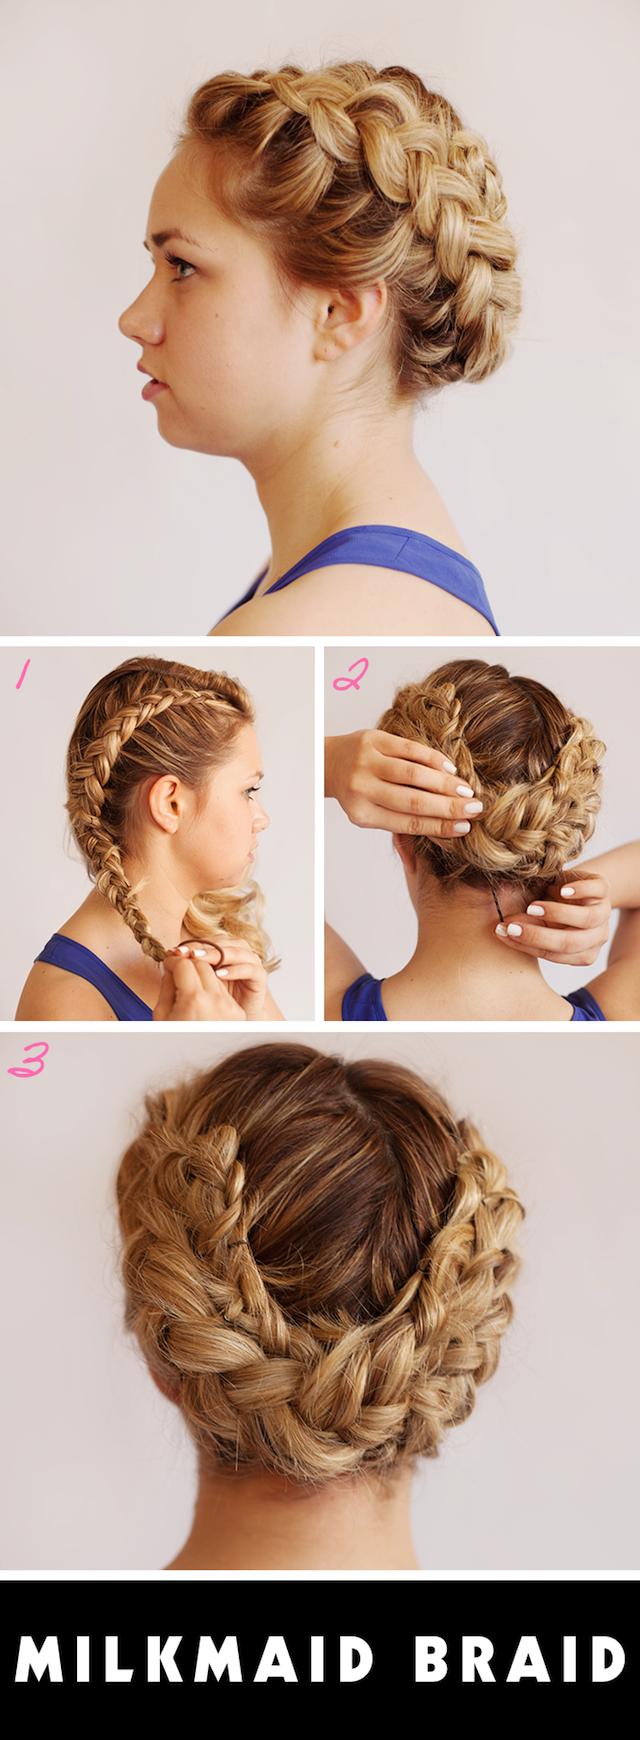 Prom-Hair_Milkmaid-Braid